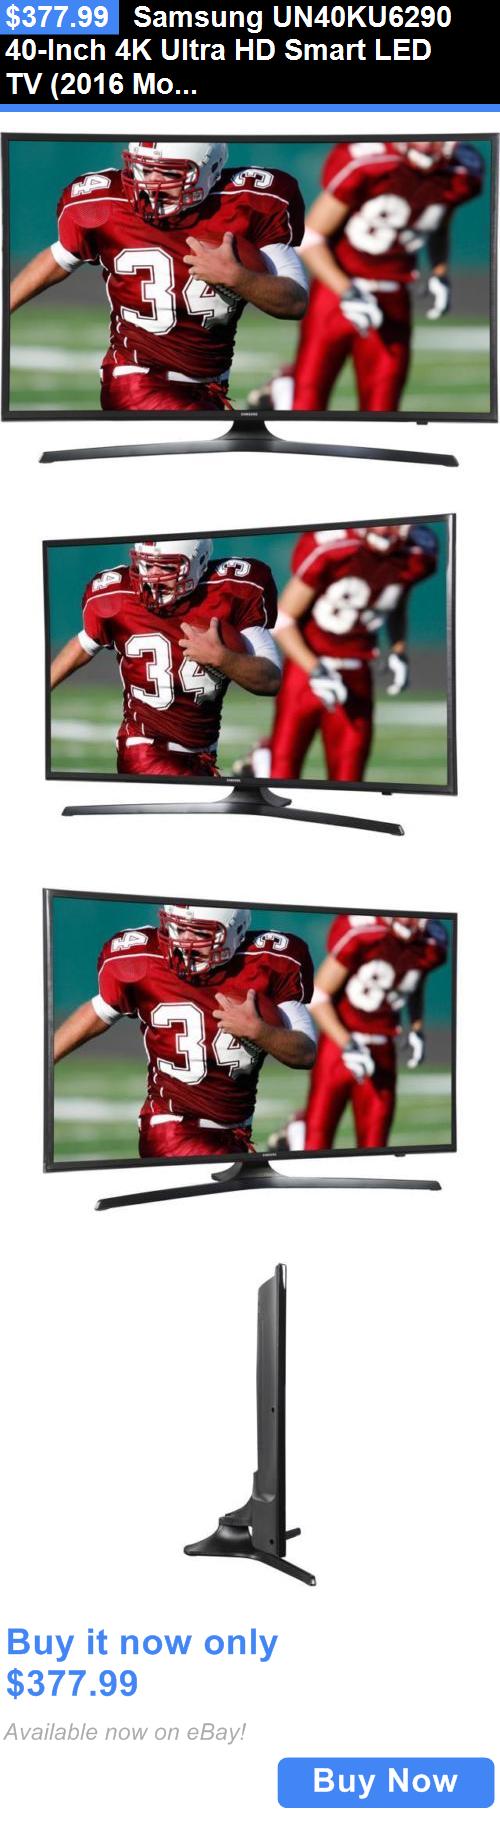 Smart TV Samsung Un40ku6290 40Inch 4K Ultra Hd Smart Led